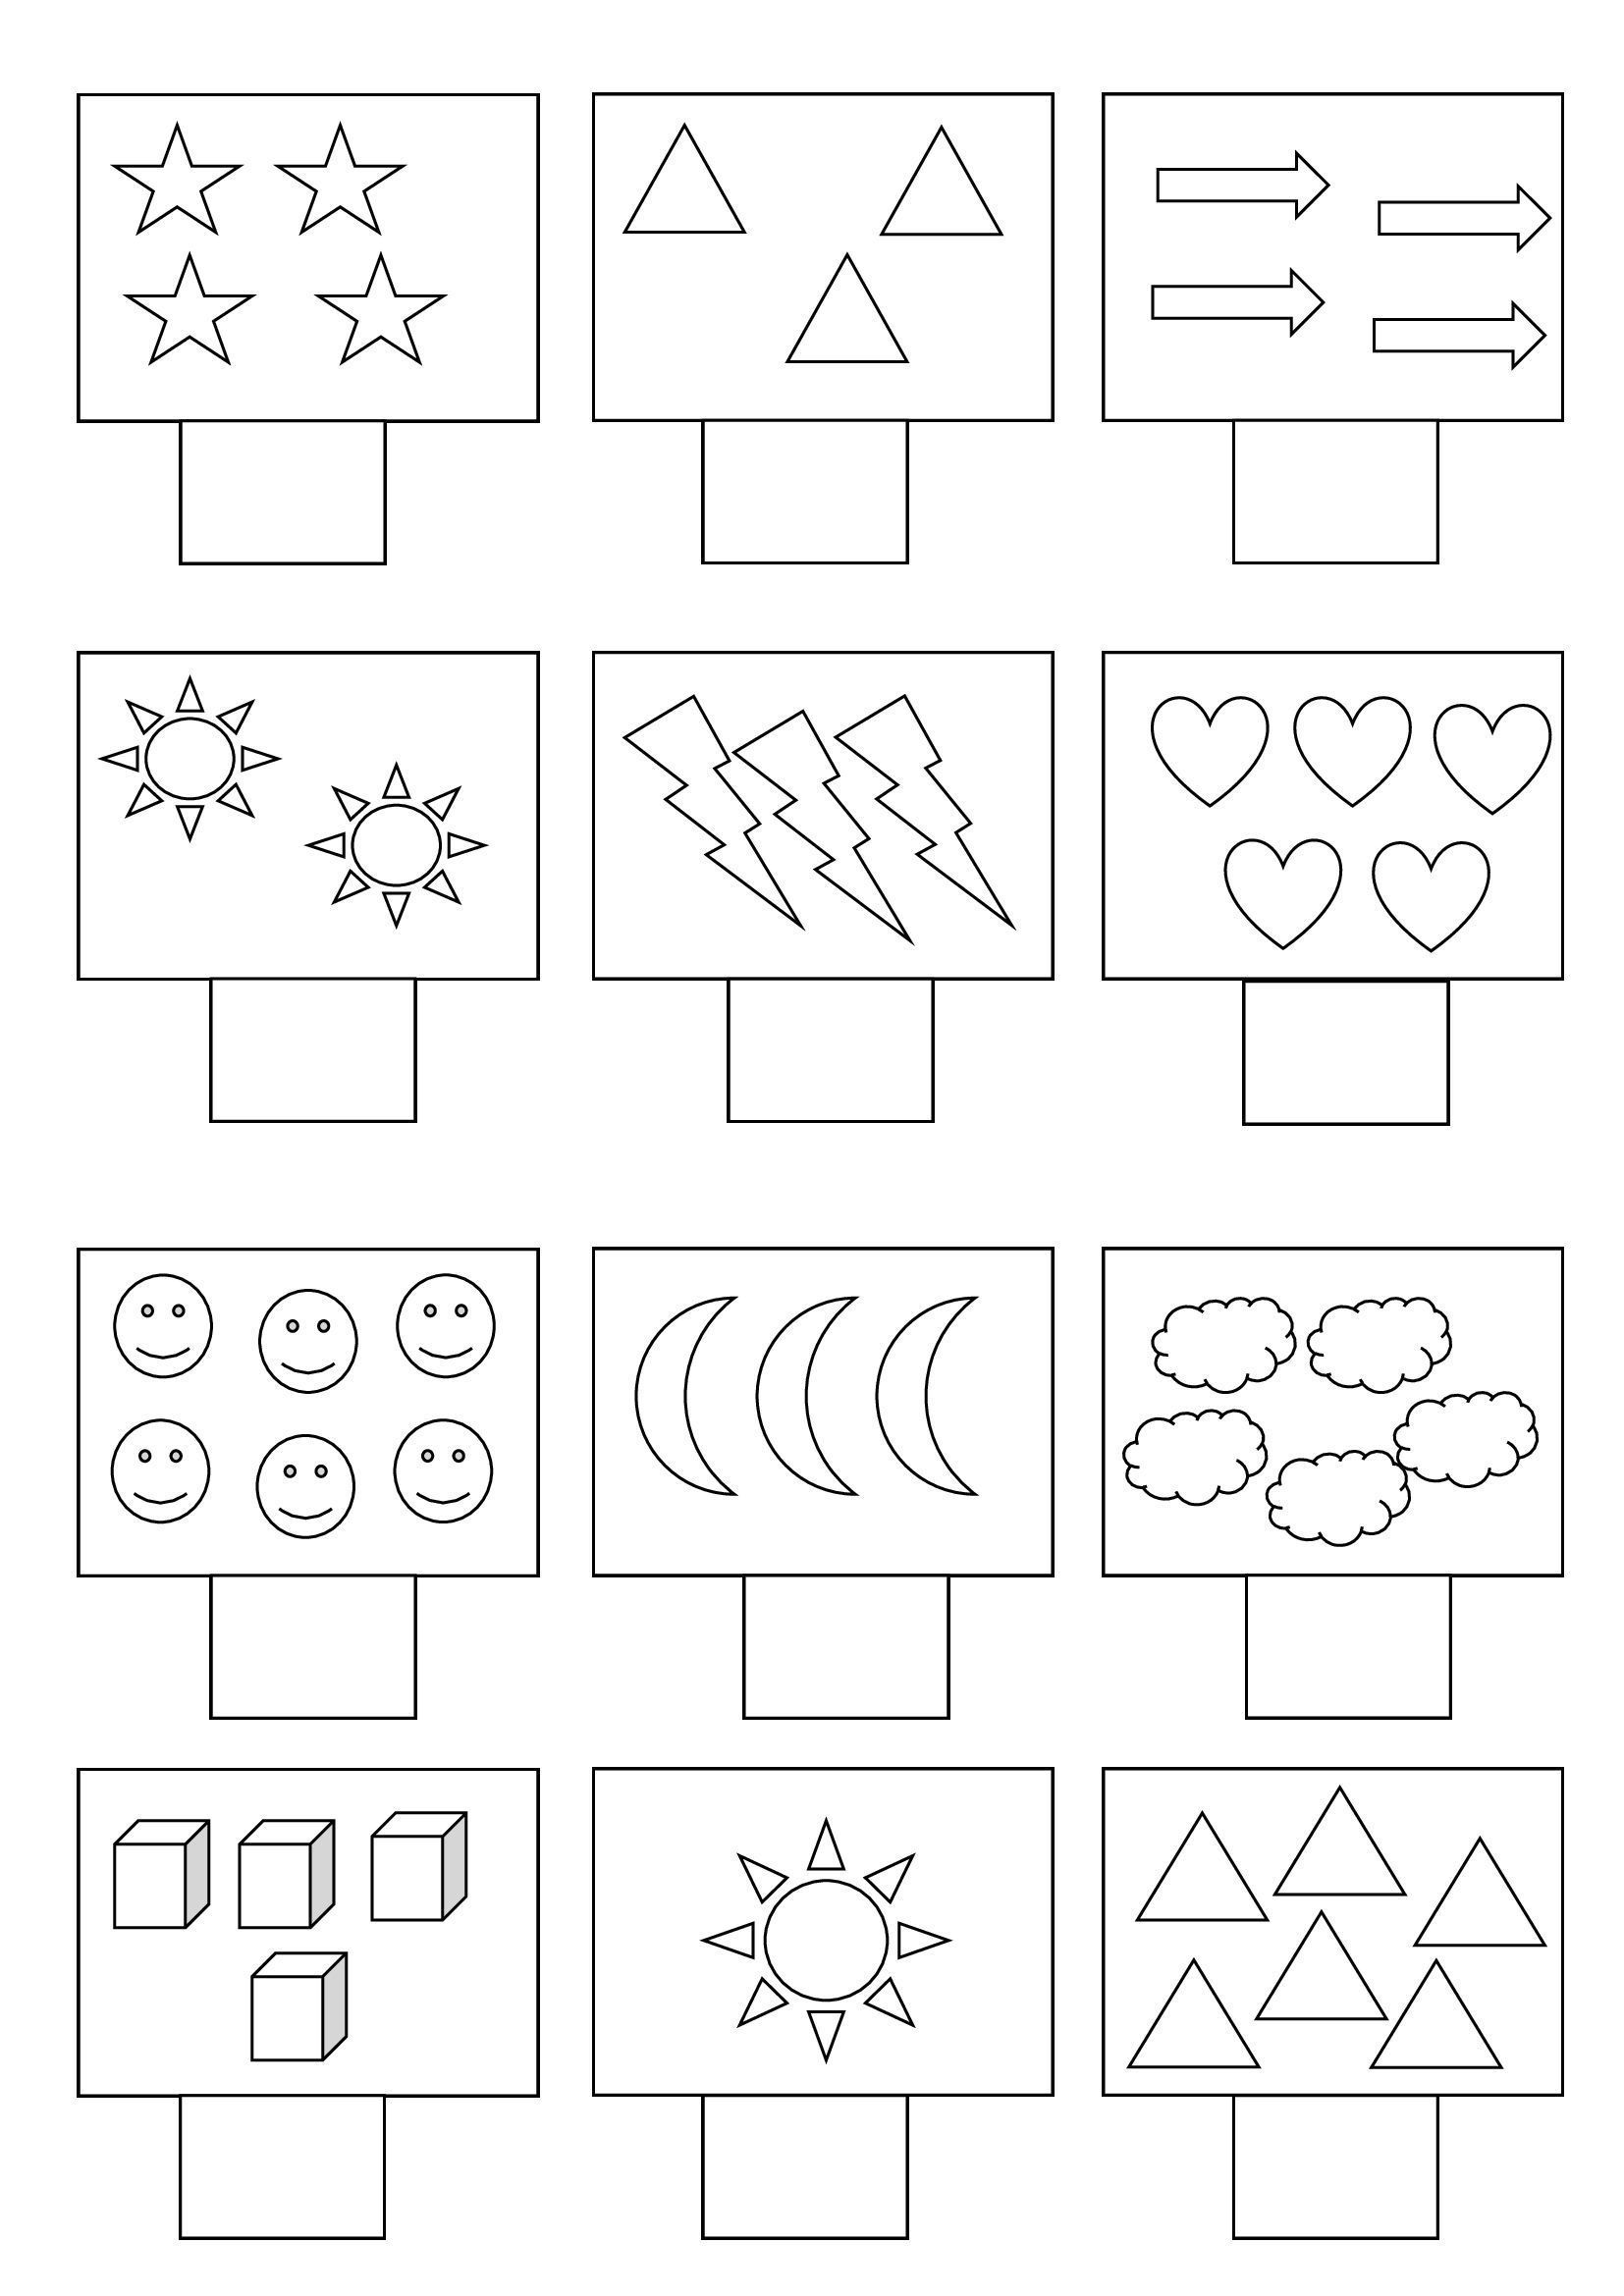 3 Math Worksheets For Lkg Saya Rakam Ala Ma